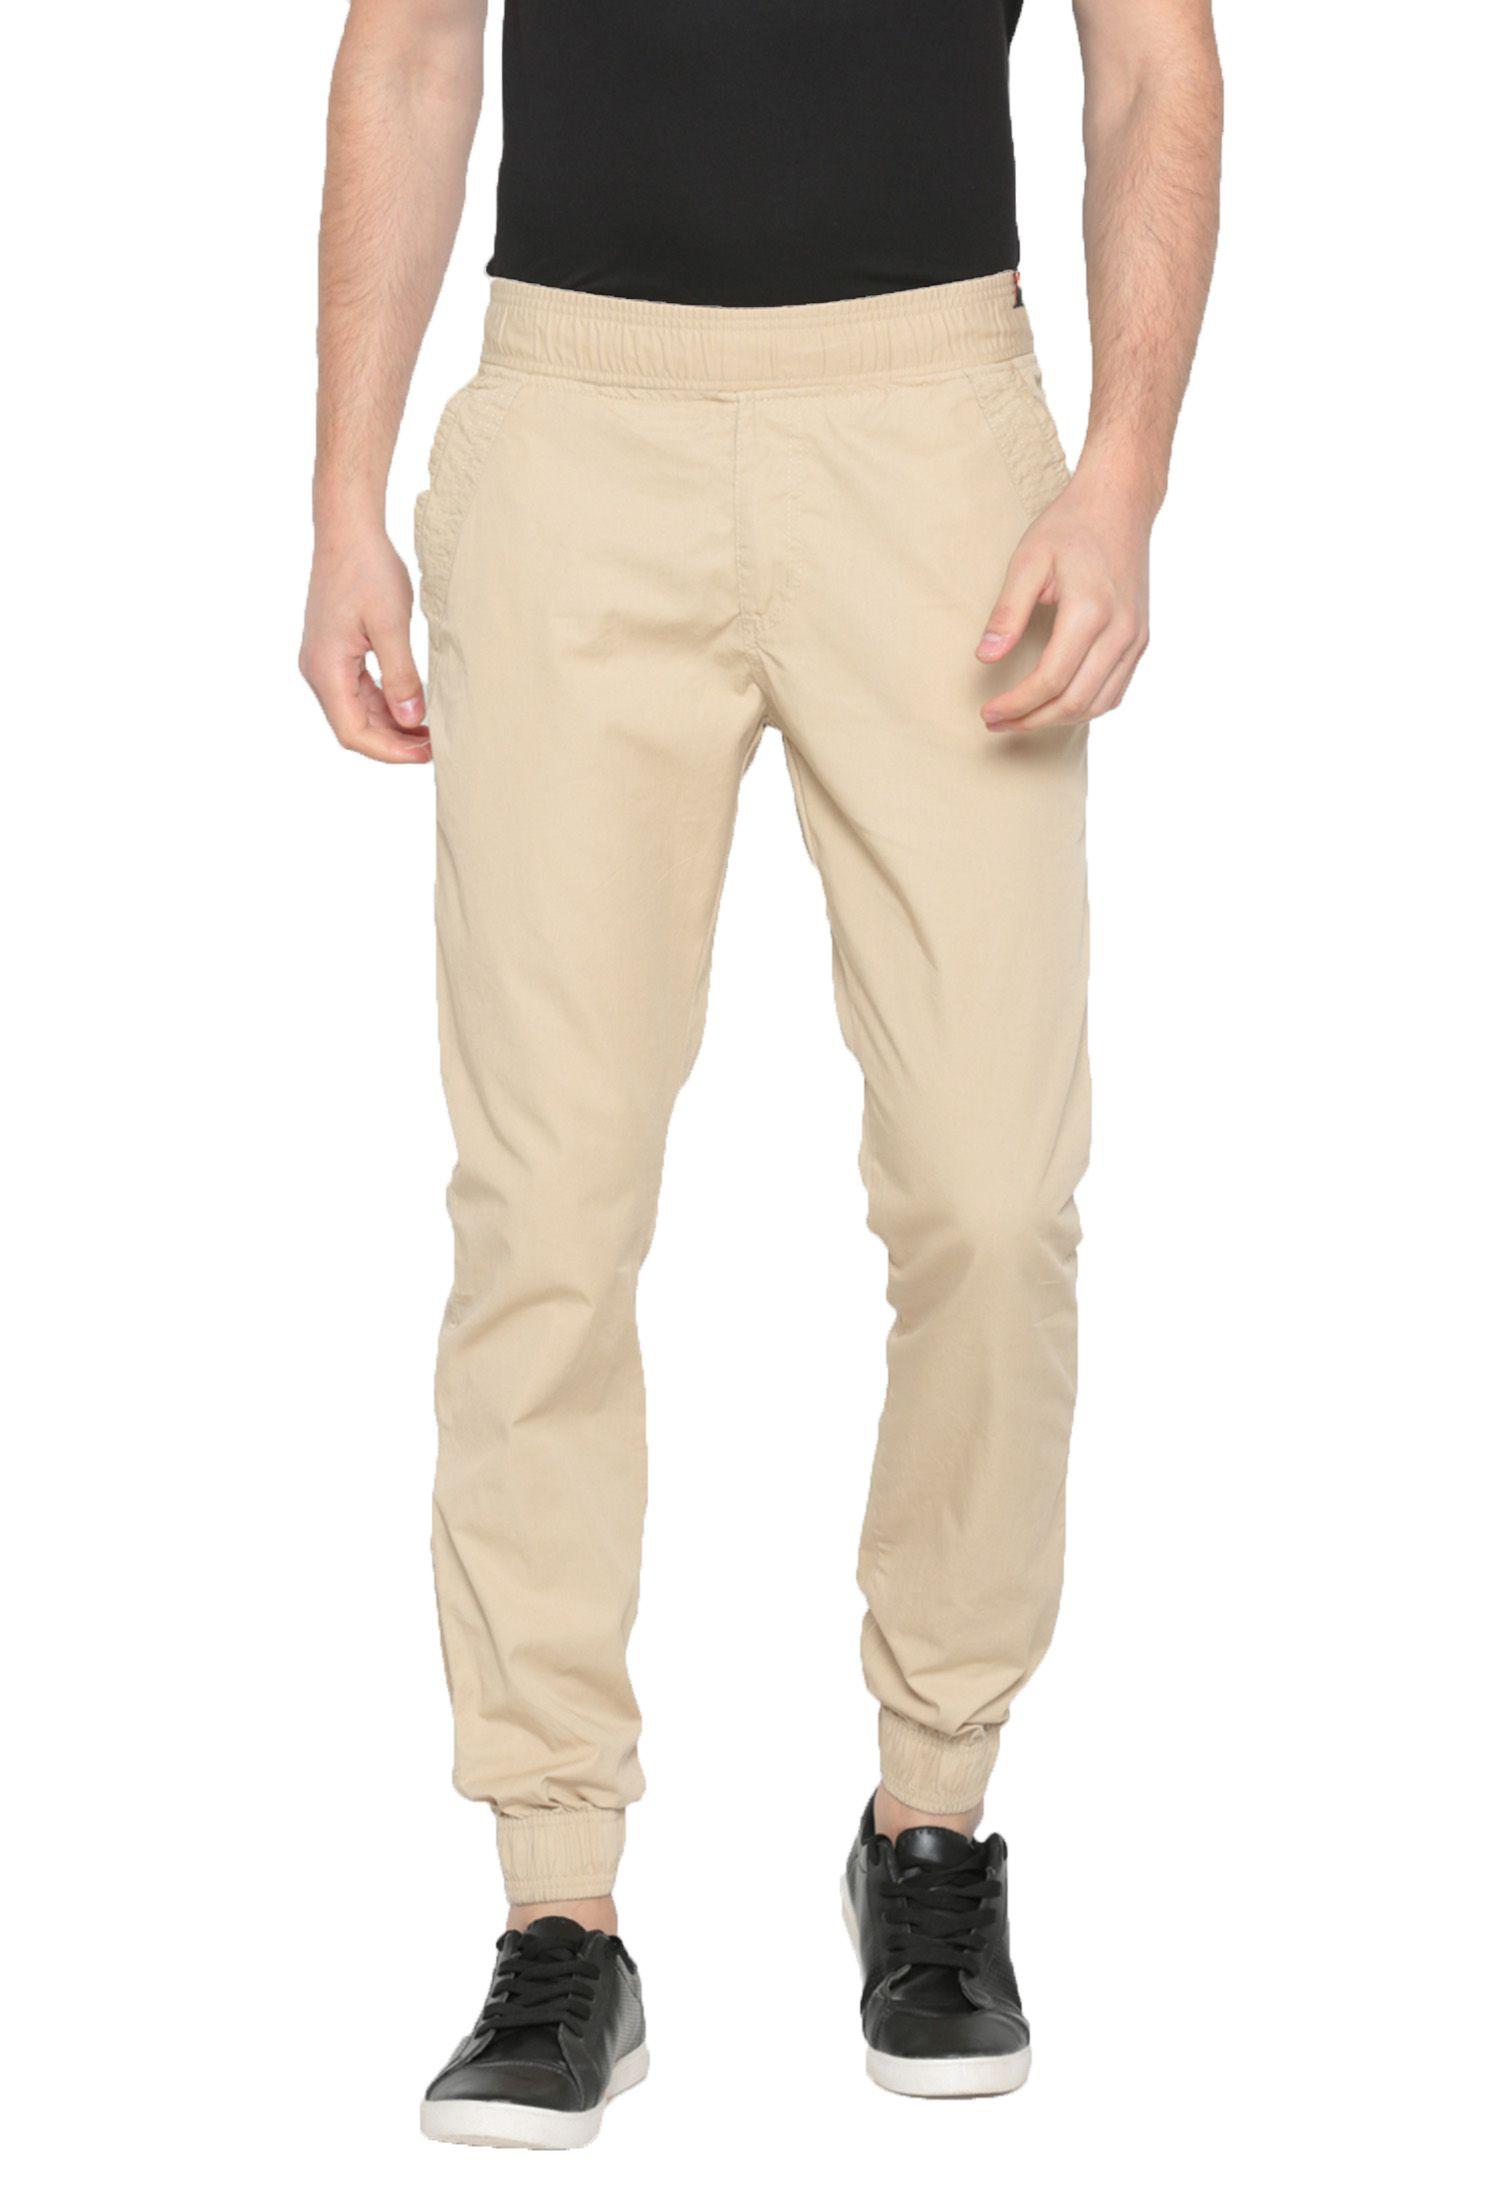 Sports 52 Wear White Slim -Fit Flat Joggers